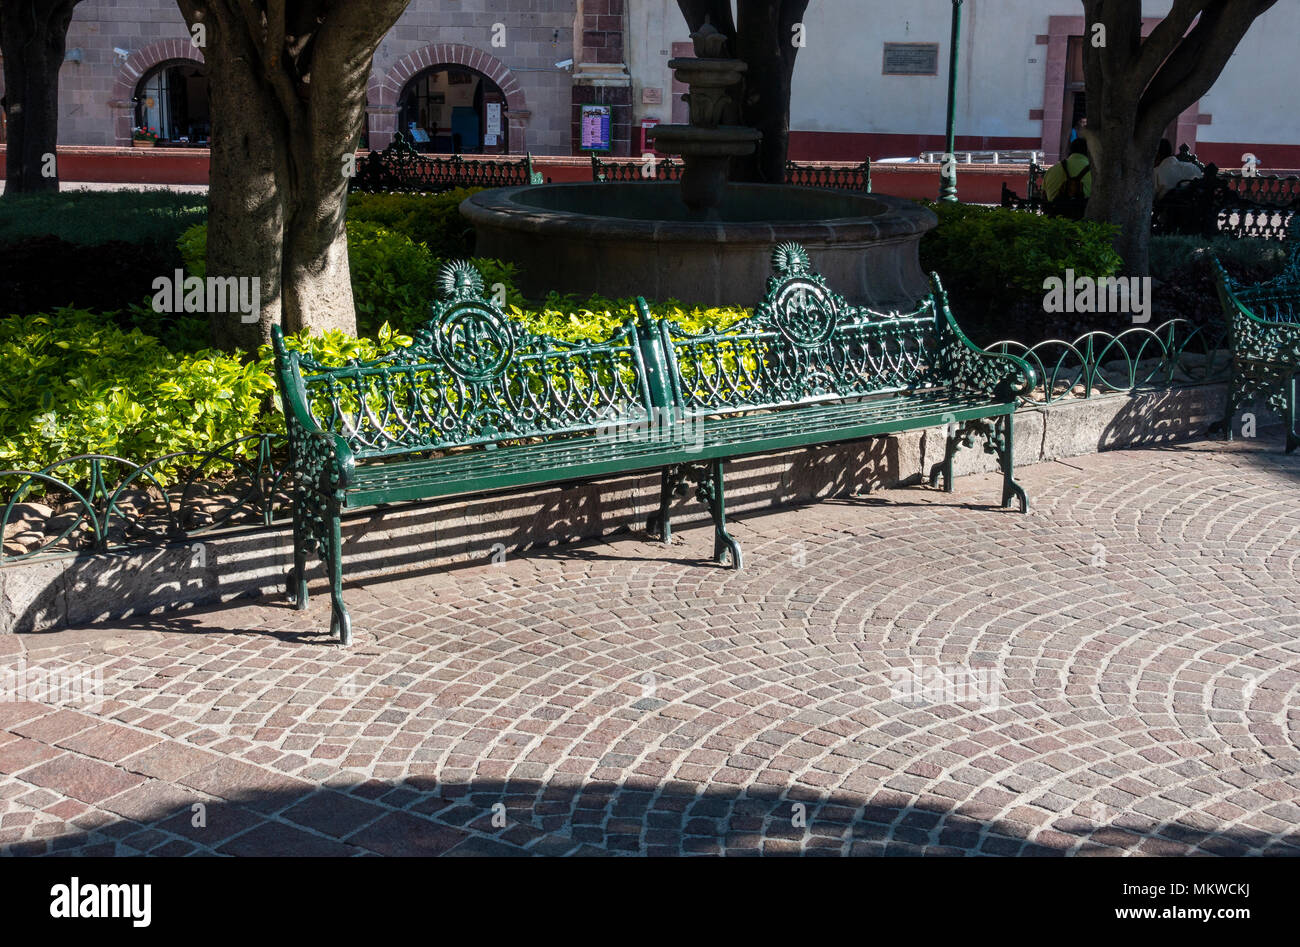 A green iron bench in El Jardin (the garden) in the center of San Miguel de Allende in Mexico, - Stock Image